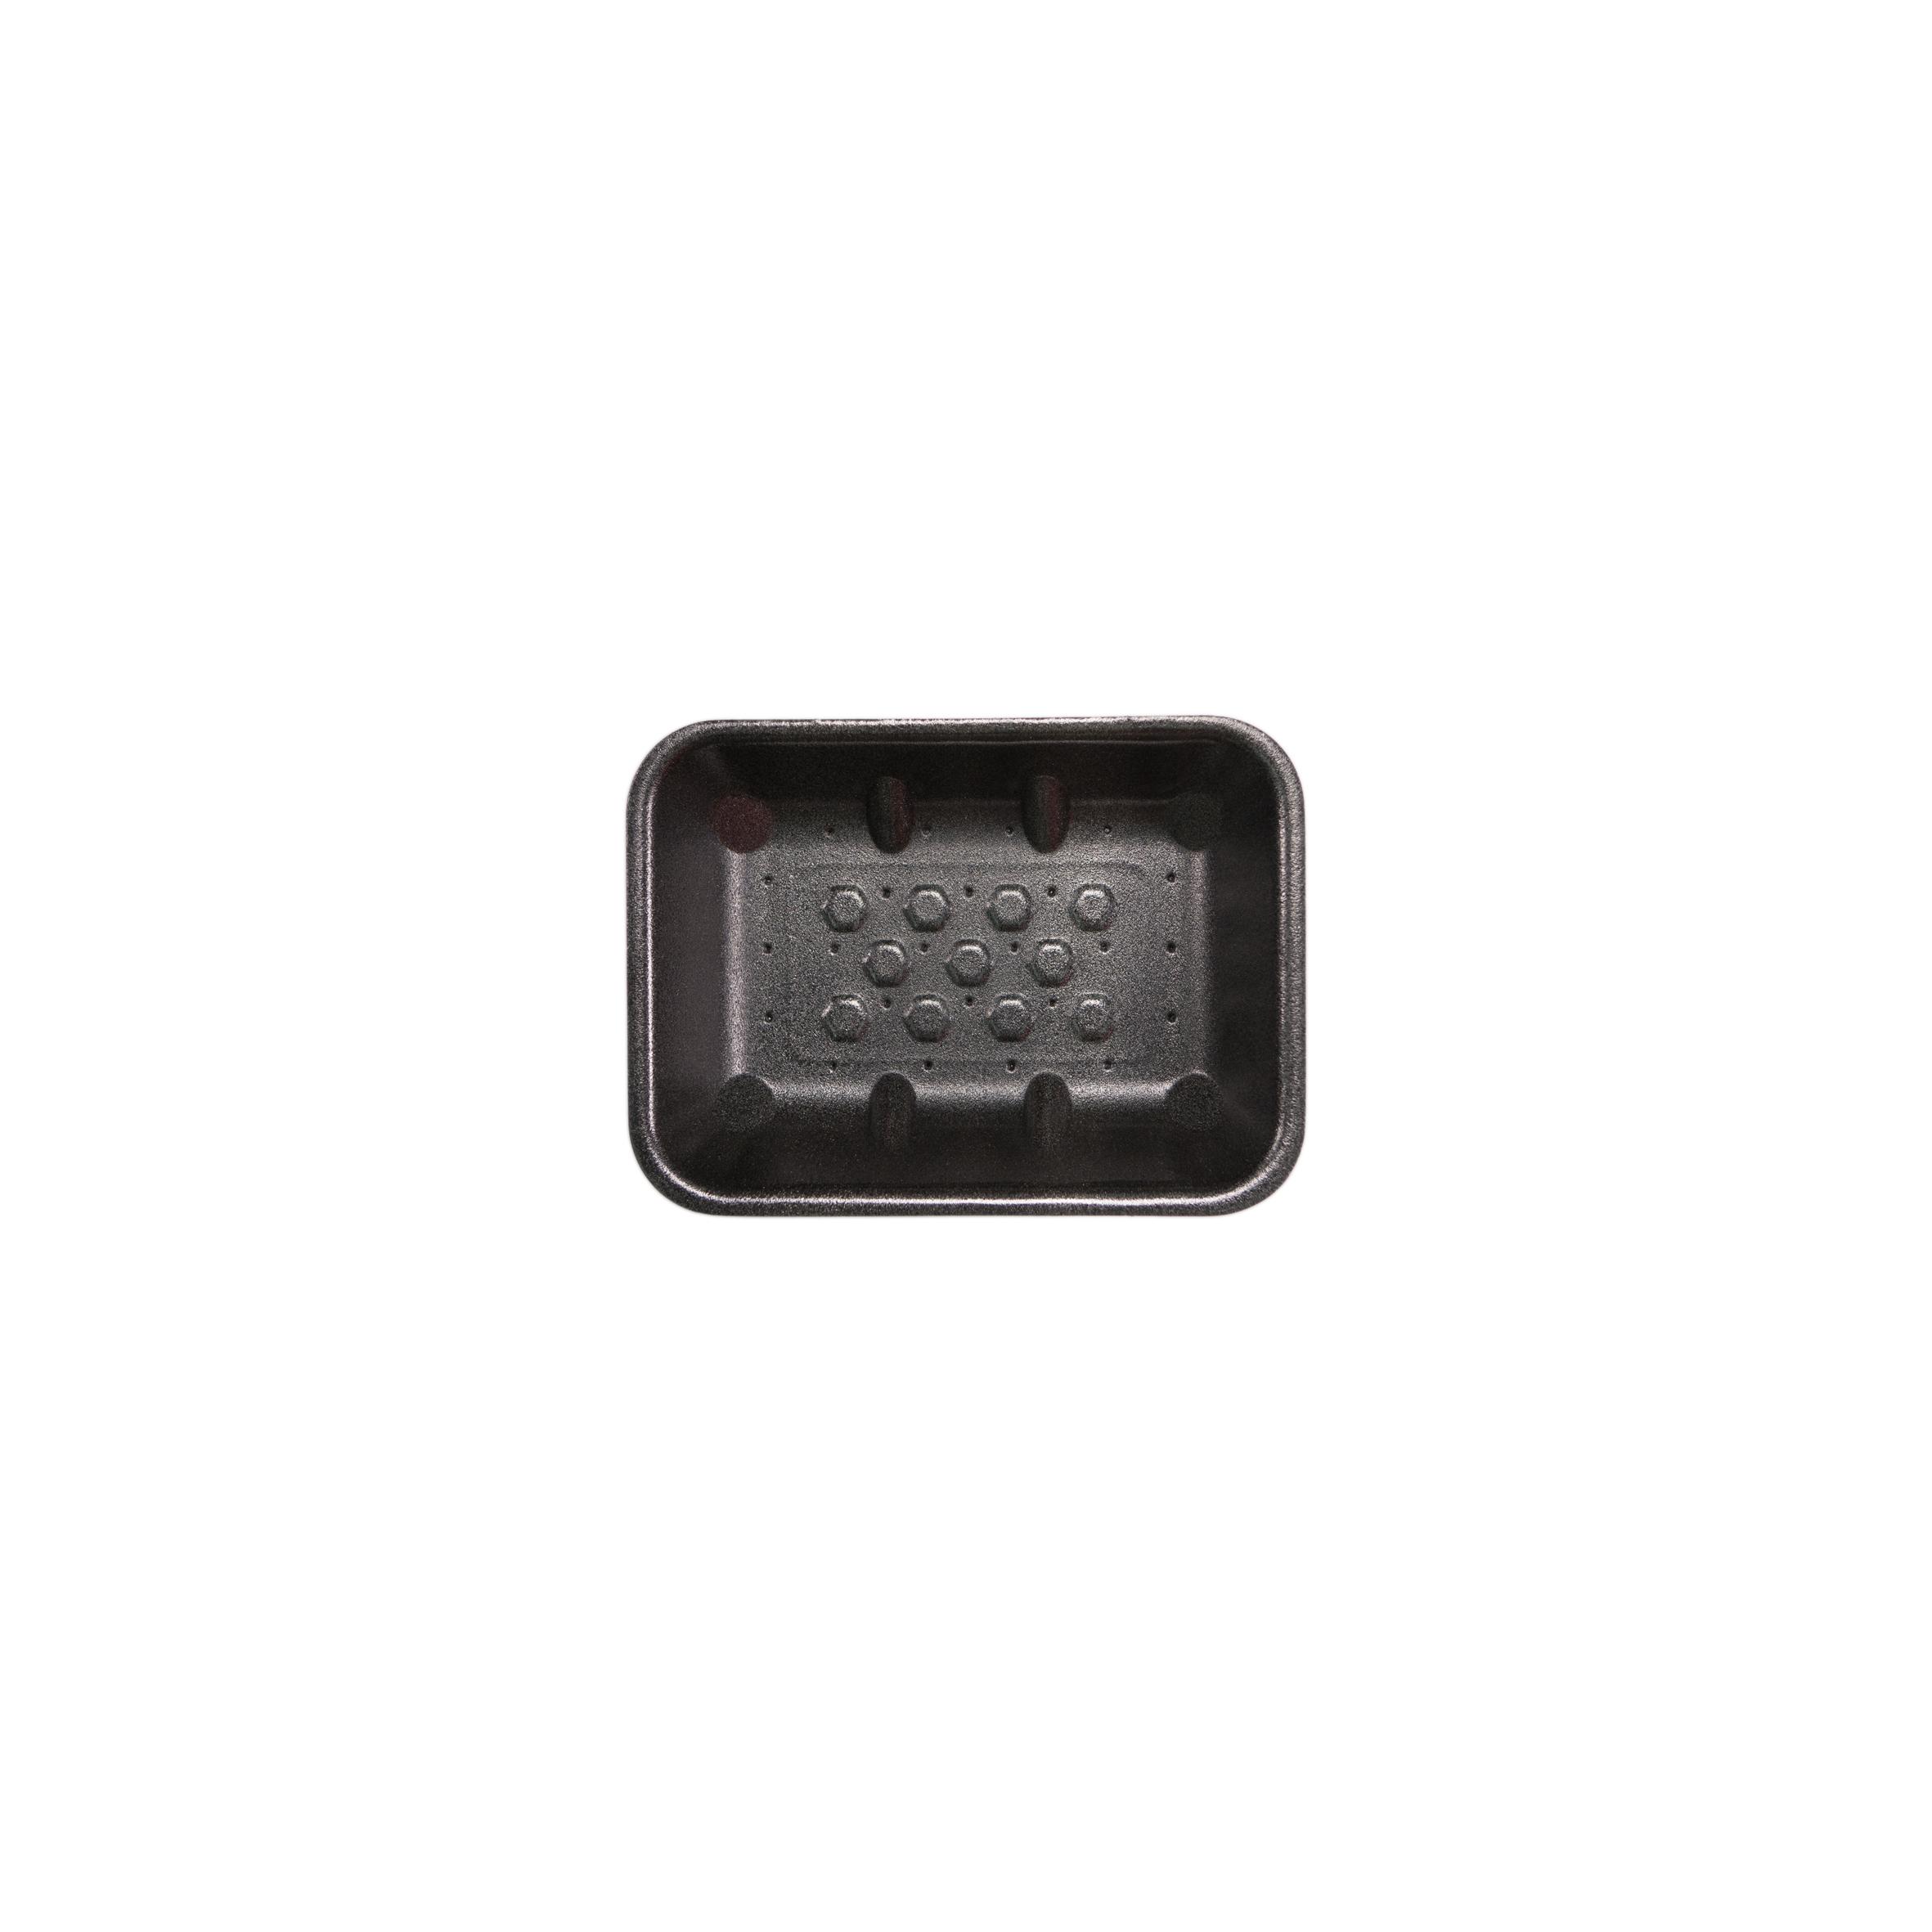 iK0101      OPEN CELL 35mm 7x5    90 per sleeve 720 per carton